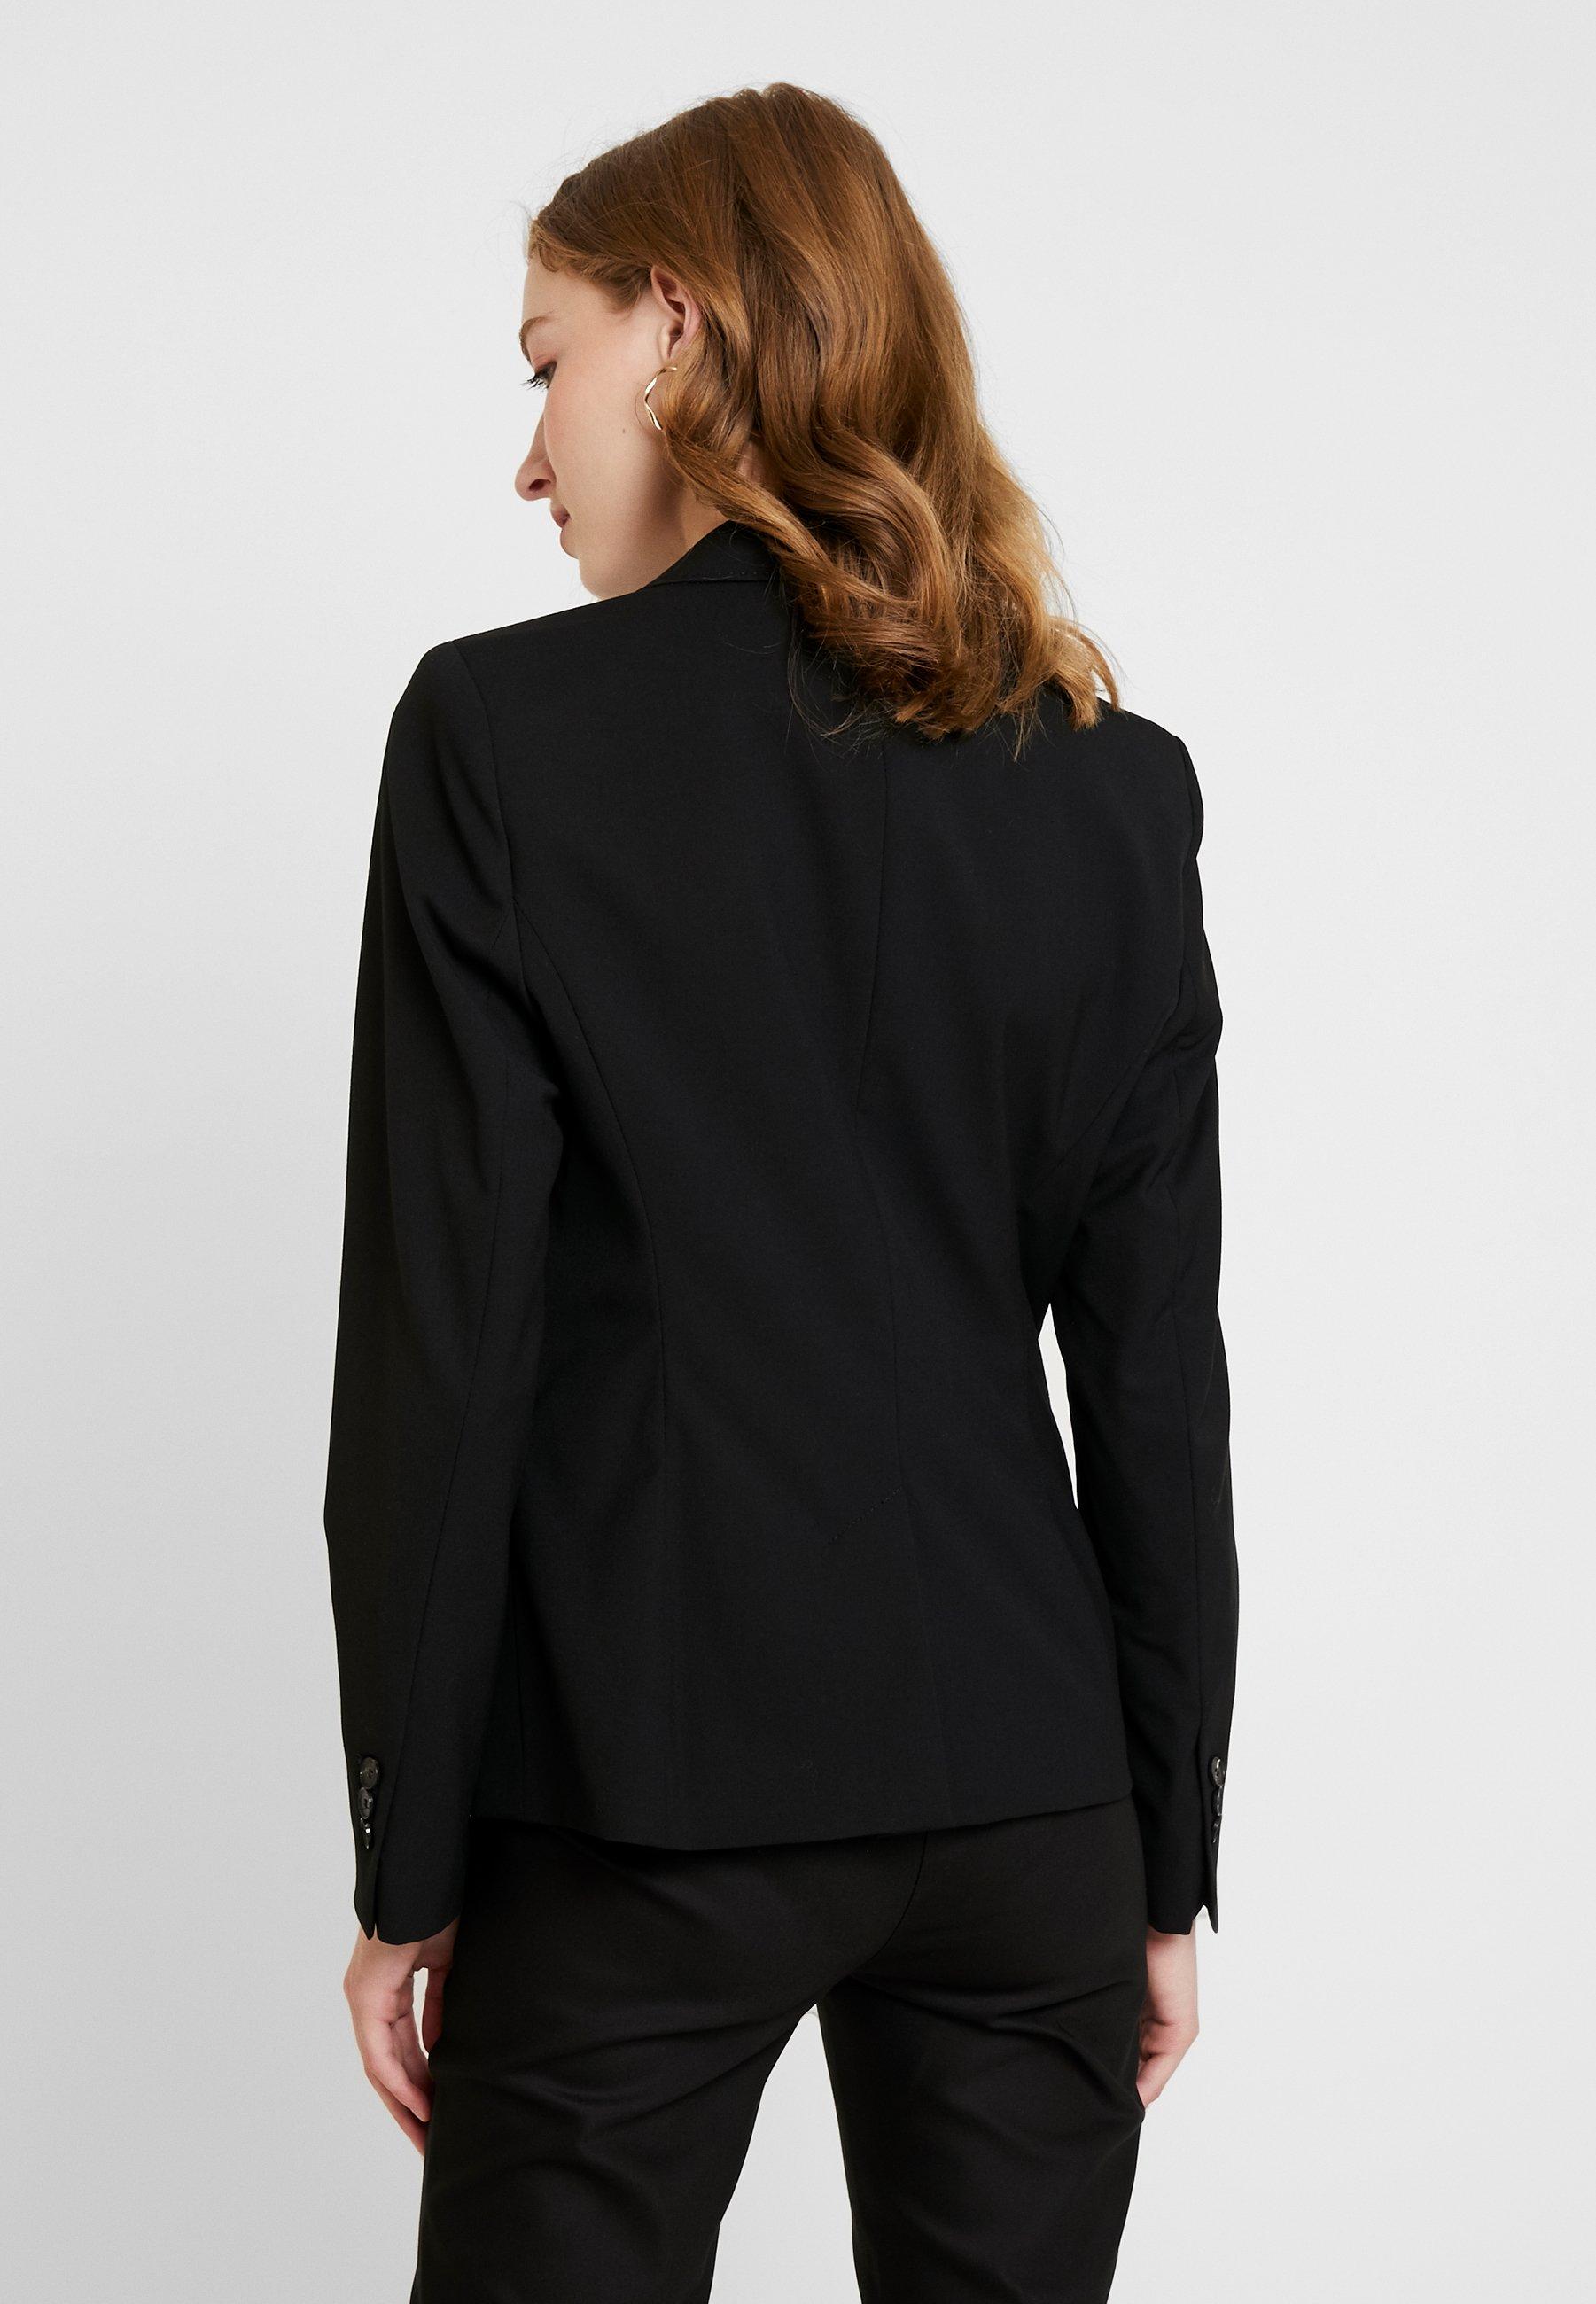 Esprit Black Collection Esprit SlimBlazer Black Esprit Collection Black Collection Esprit Collection SlimBlazer SlimBlazer A5R4Lj